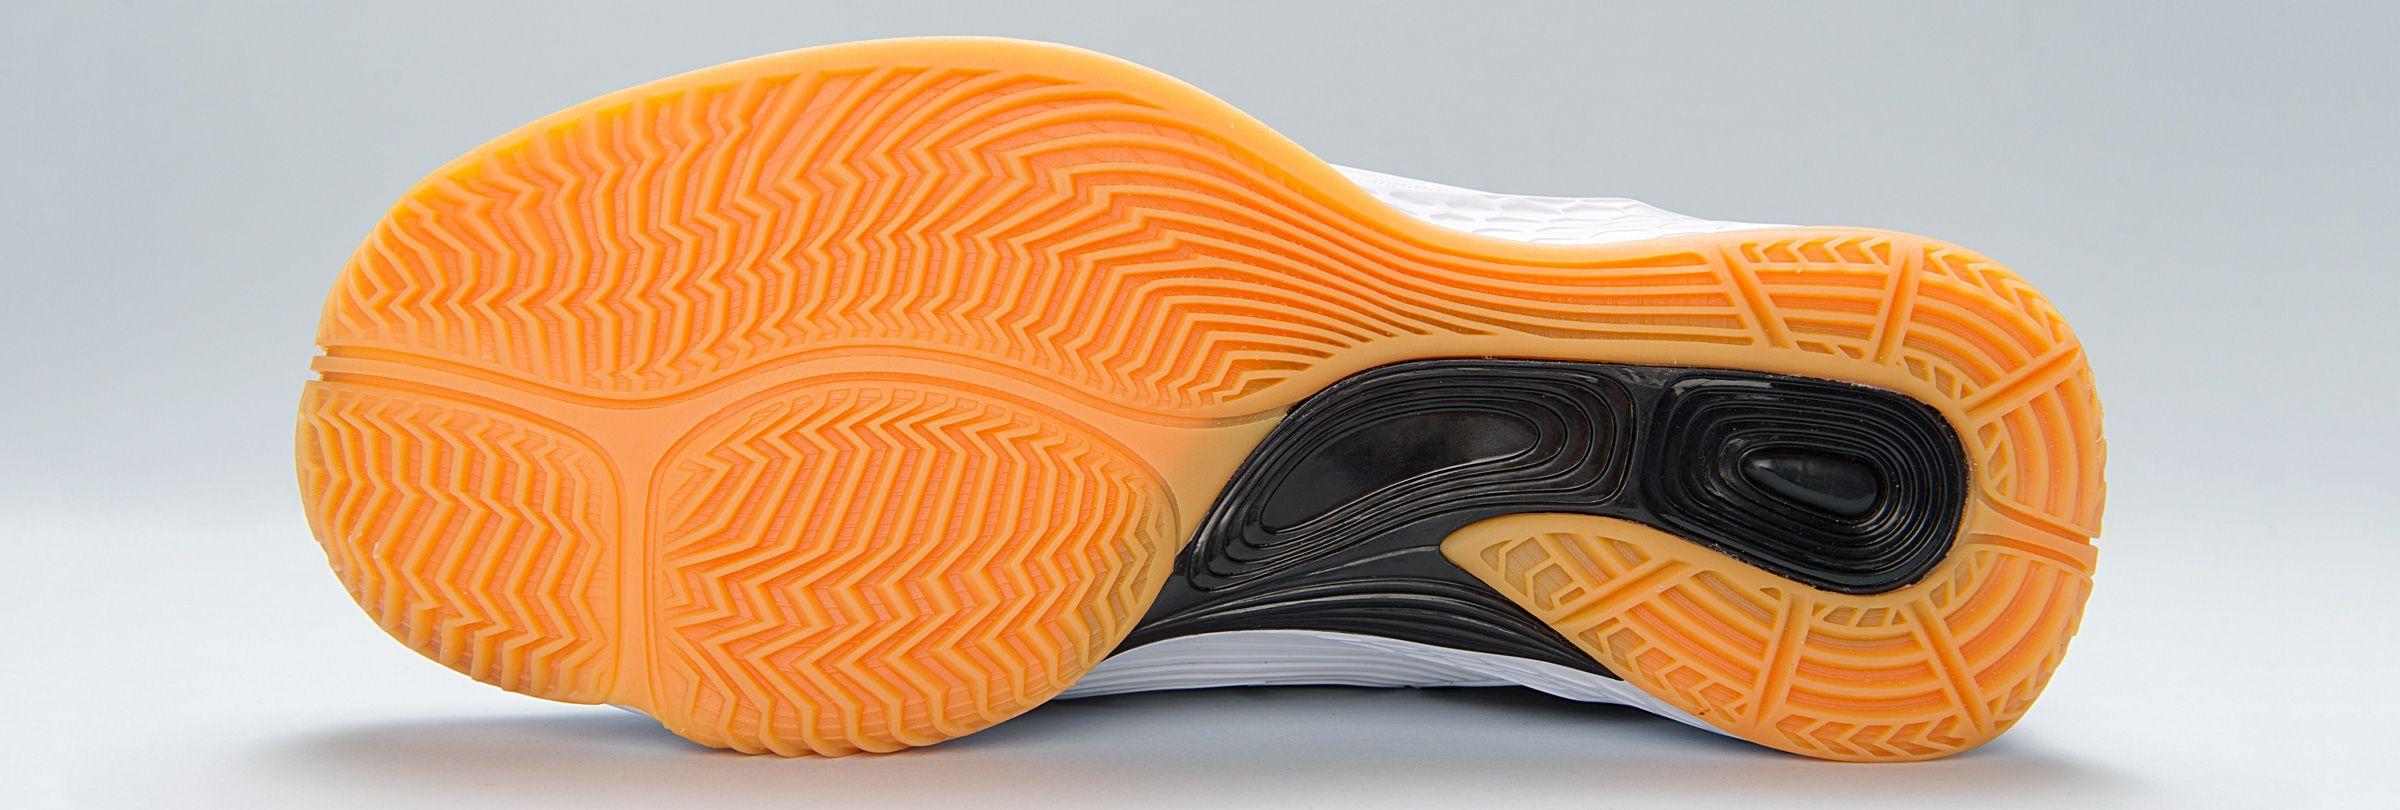 volleyball velocity shoe